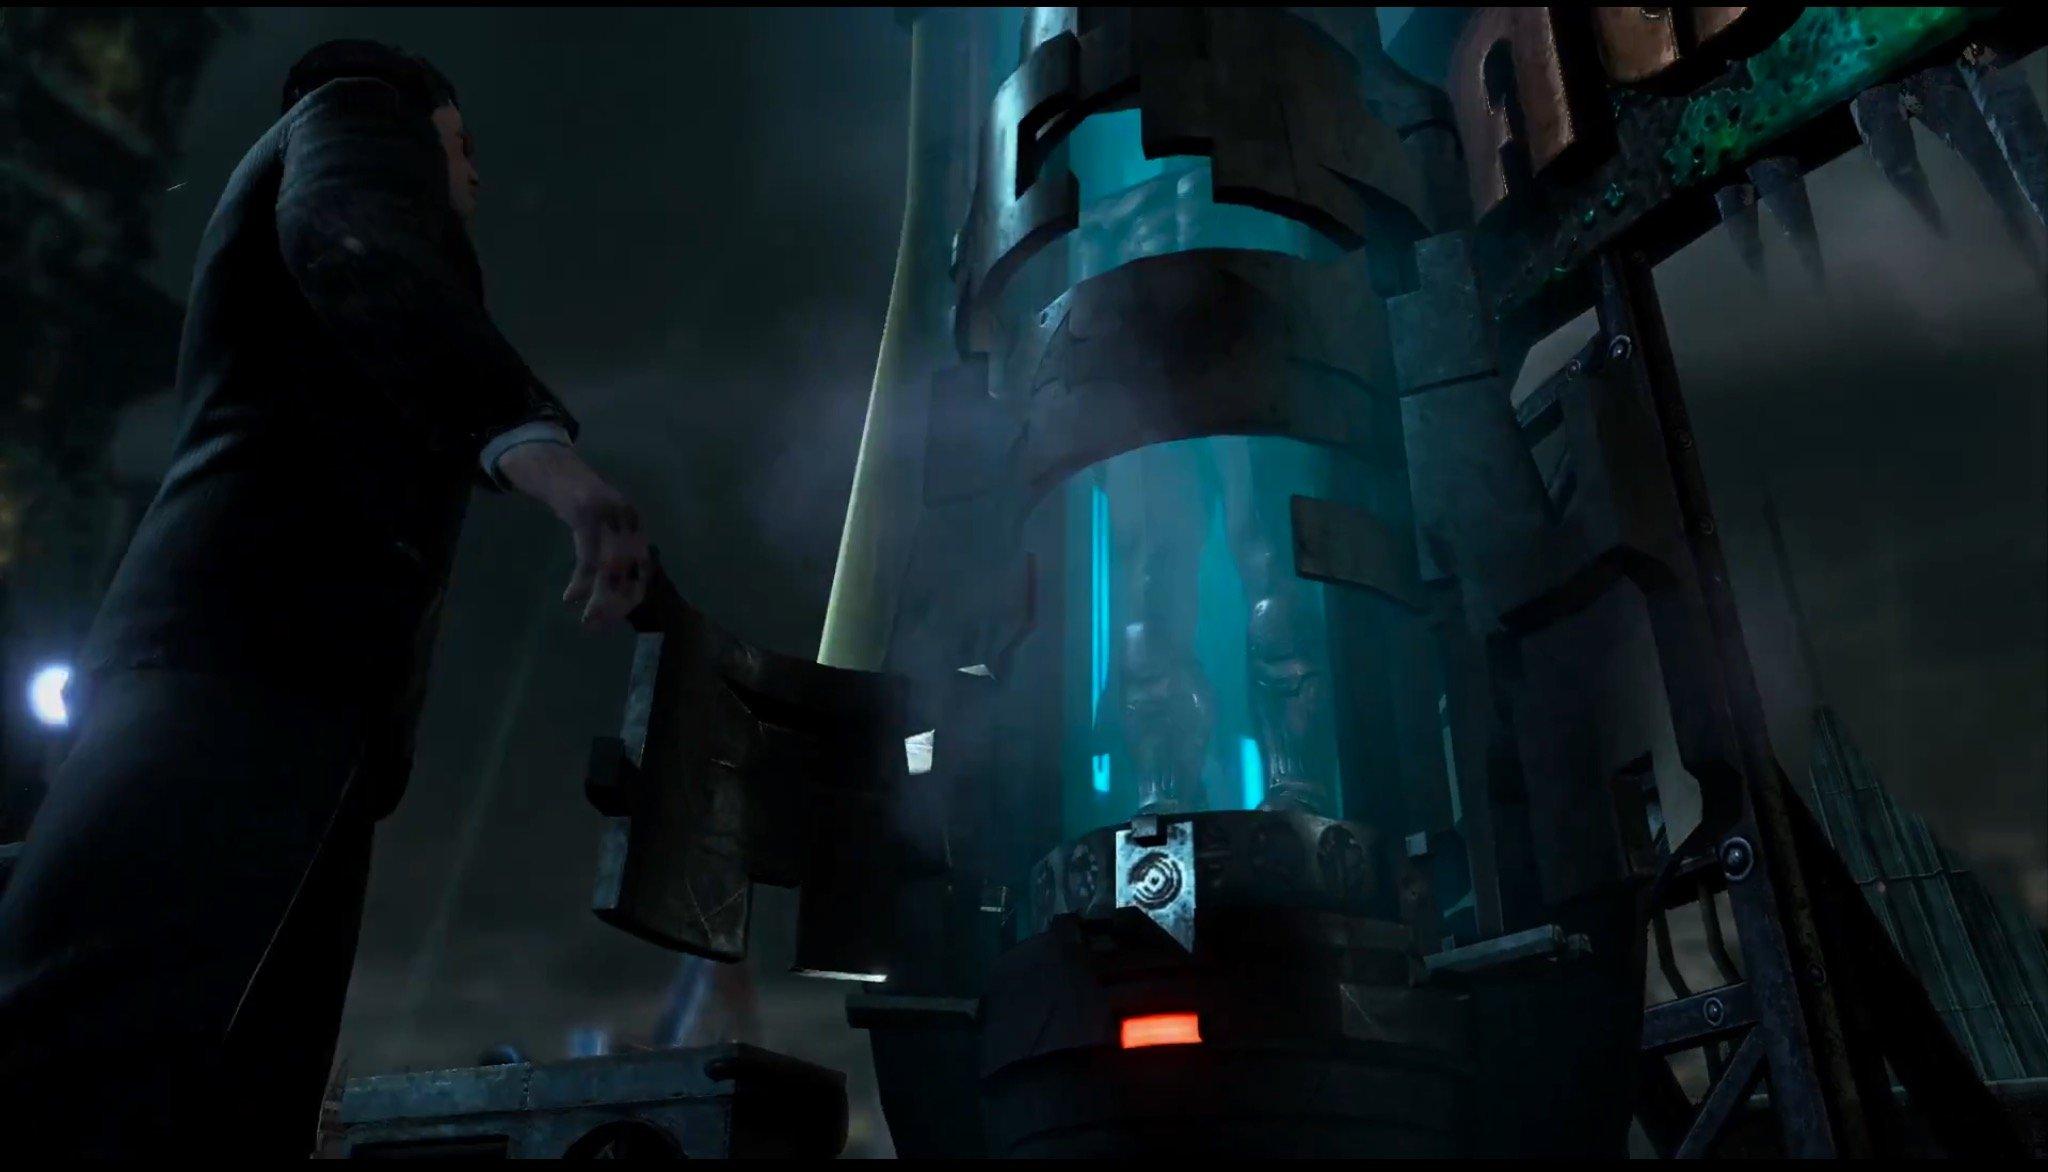 Batman Return To Arkham PS4 Vs PS3 Comparison Screens Shows UE4 Capability Stunning Graphics